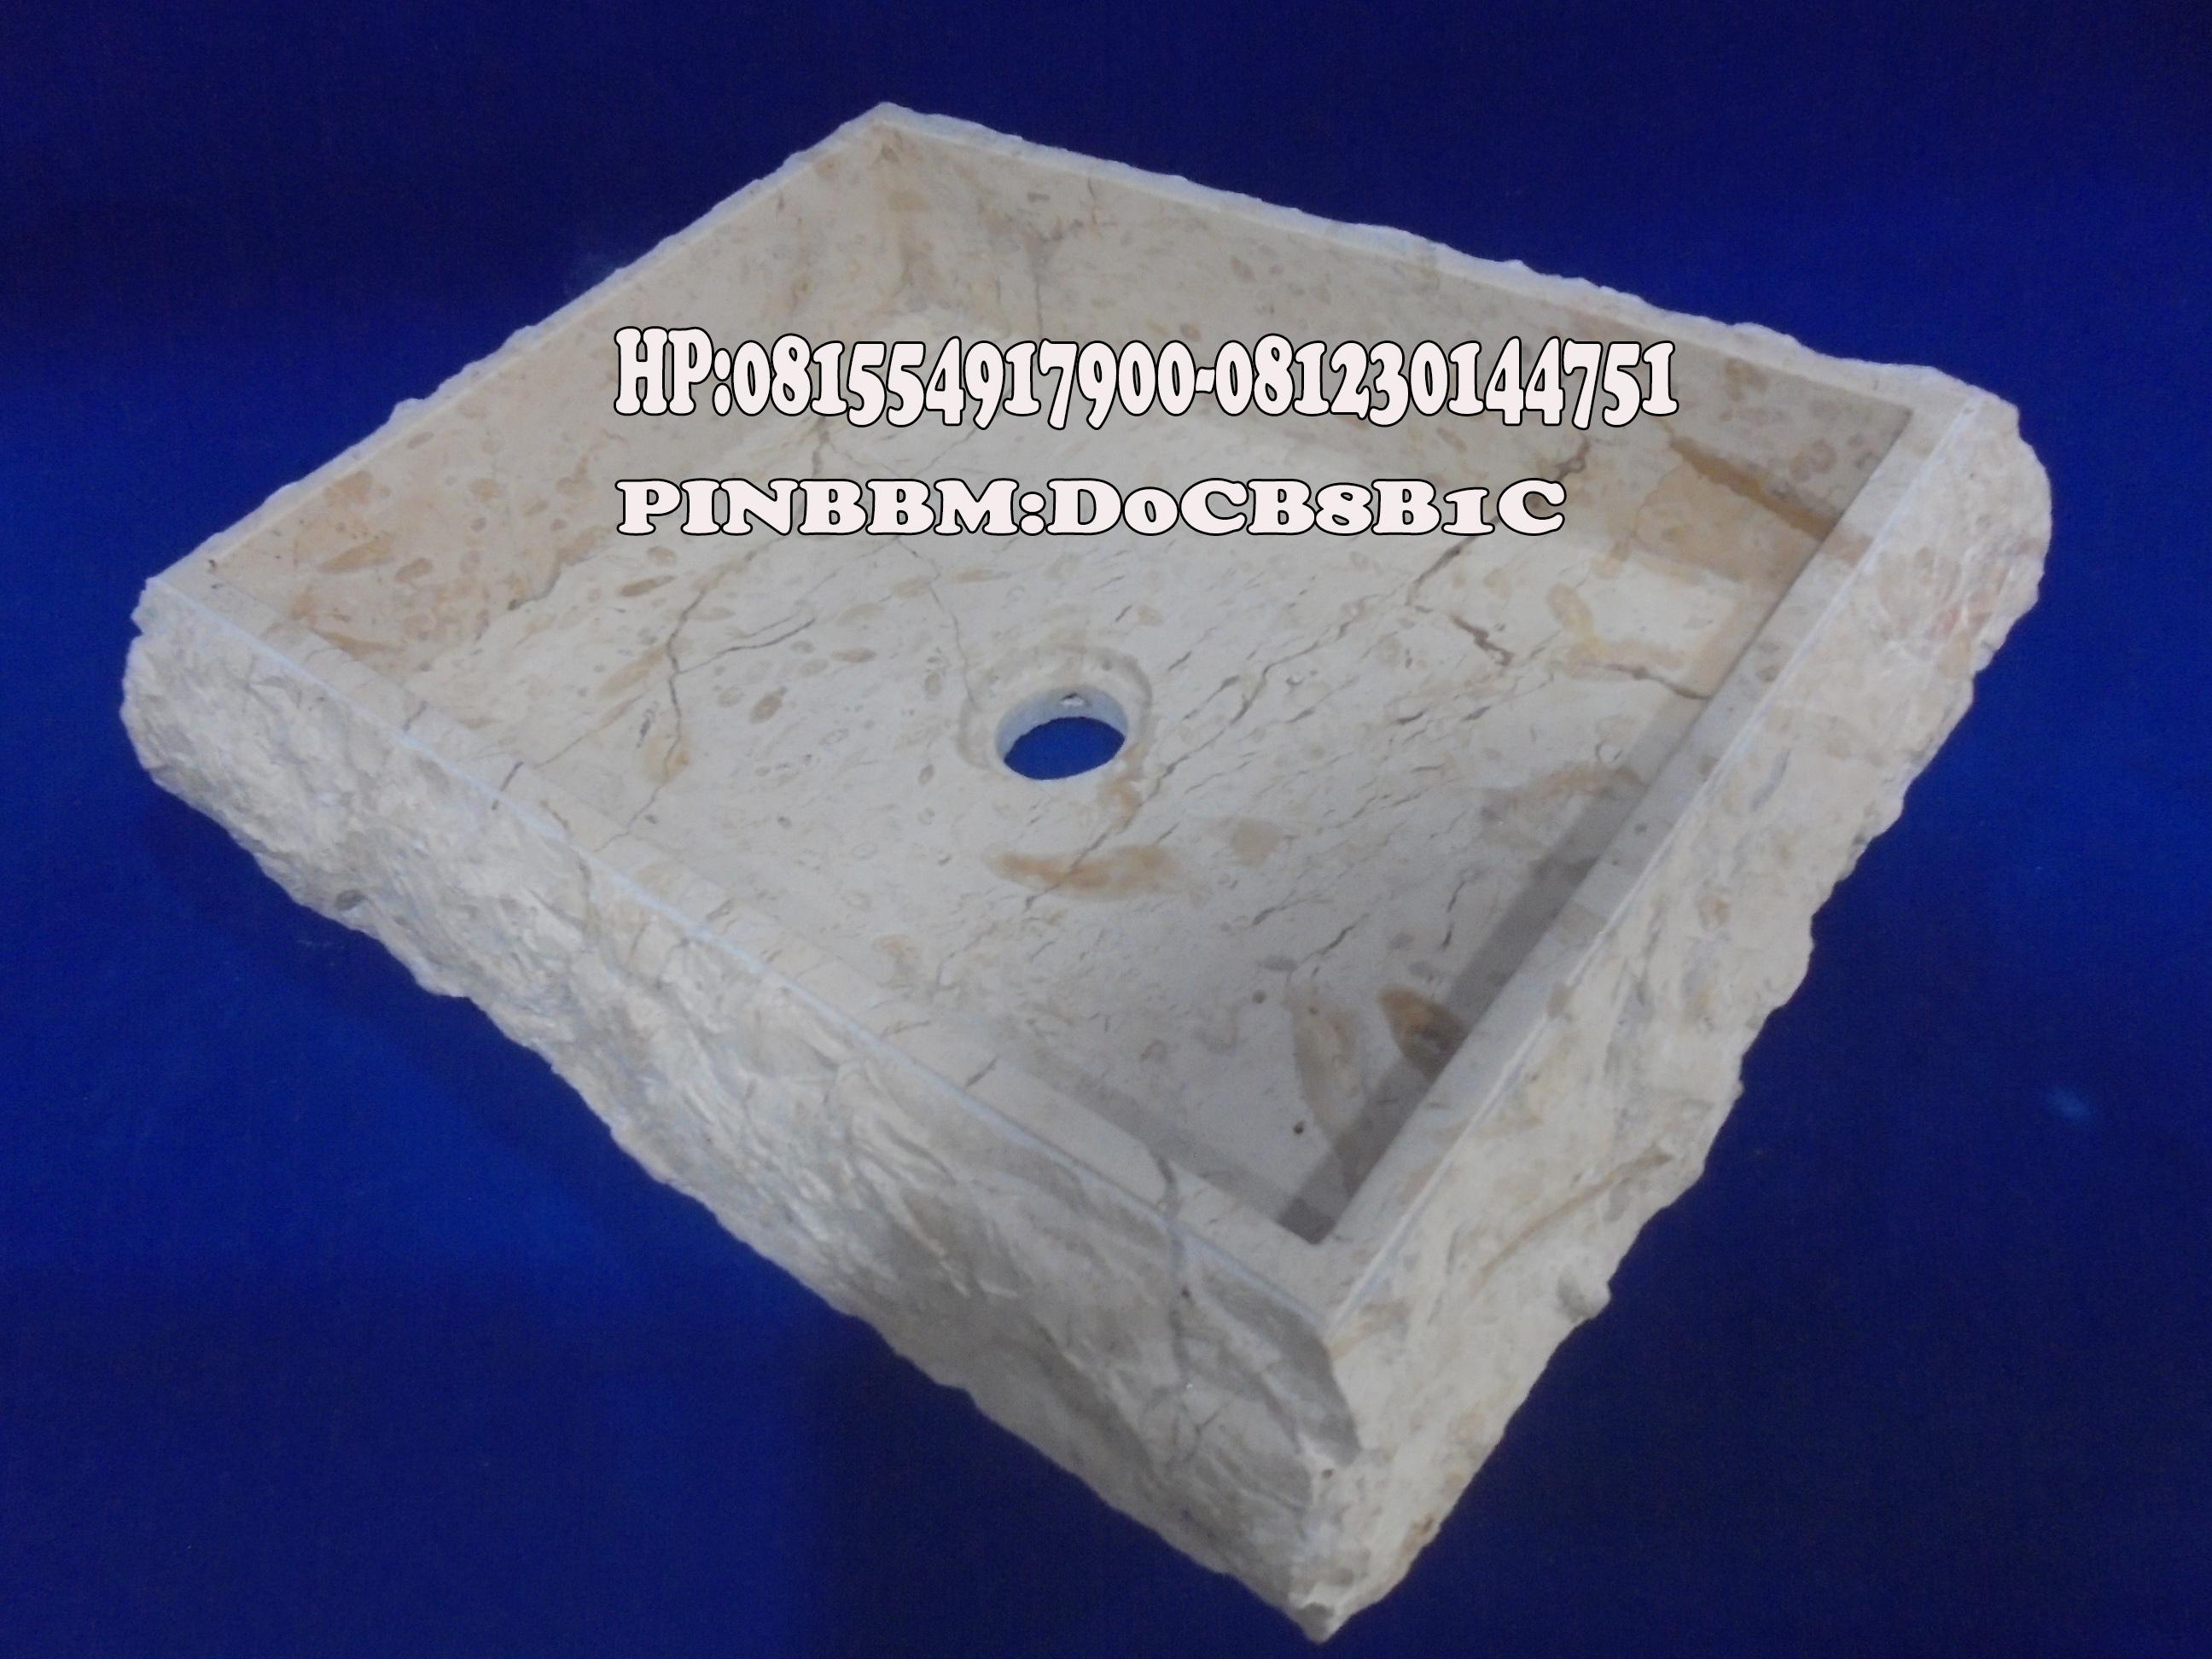 Wastafel Marmer Kotak